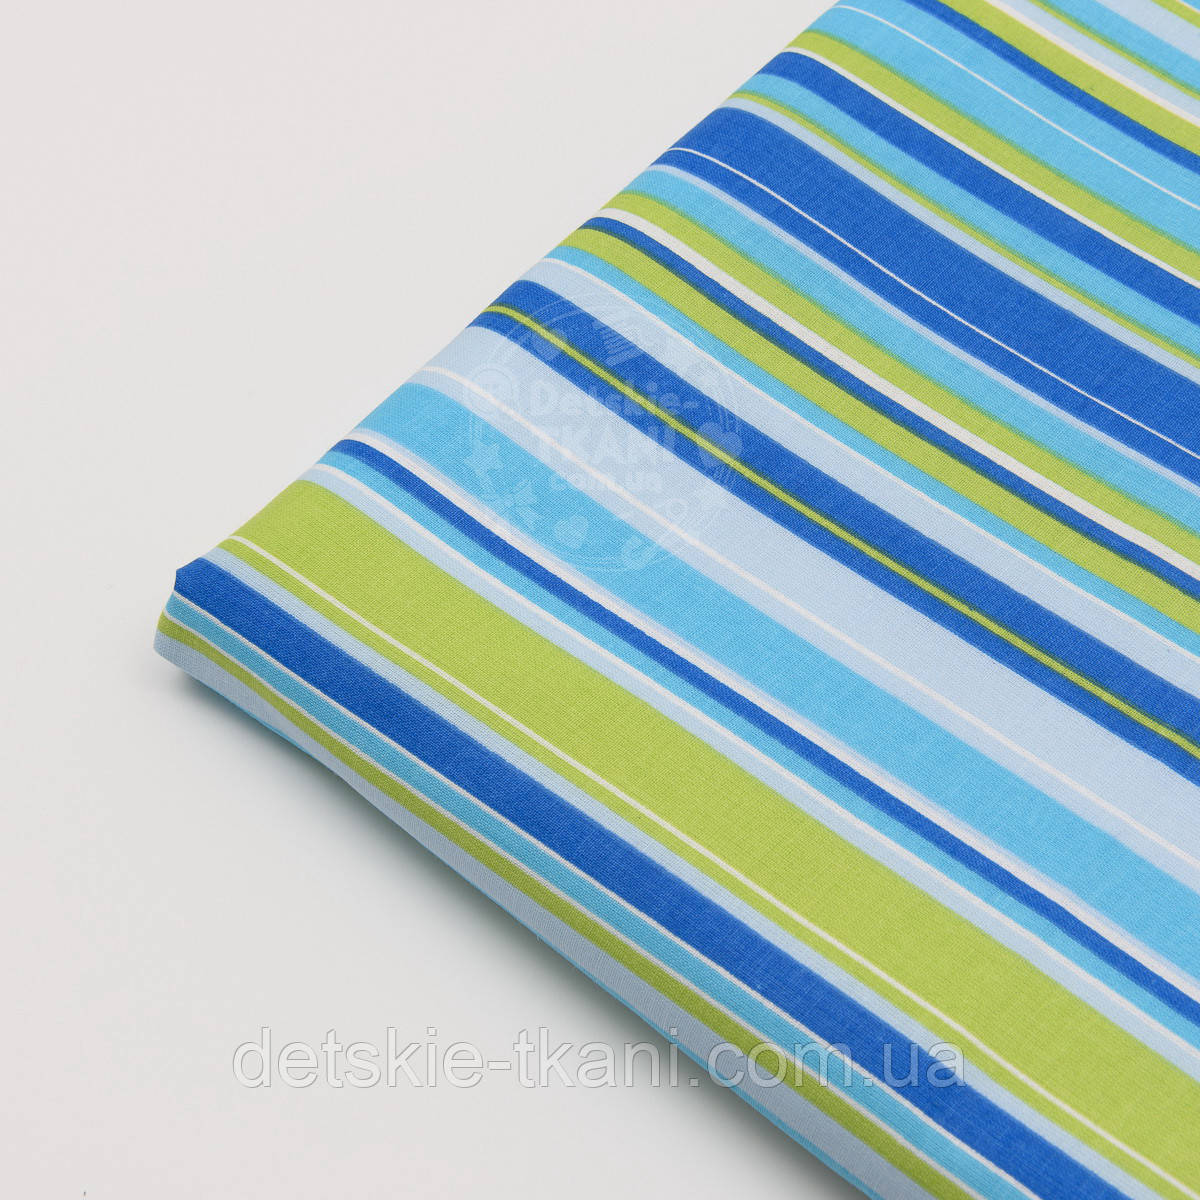 Лоскут ткани №192 размером 44*78см